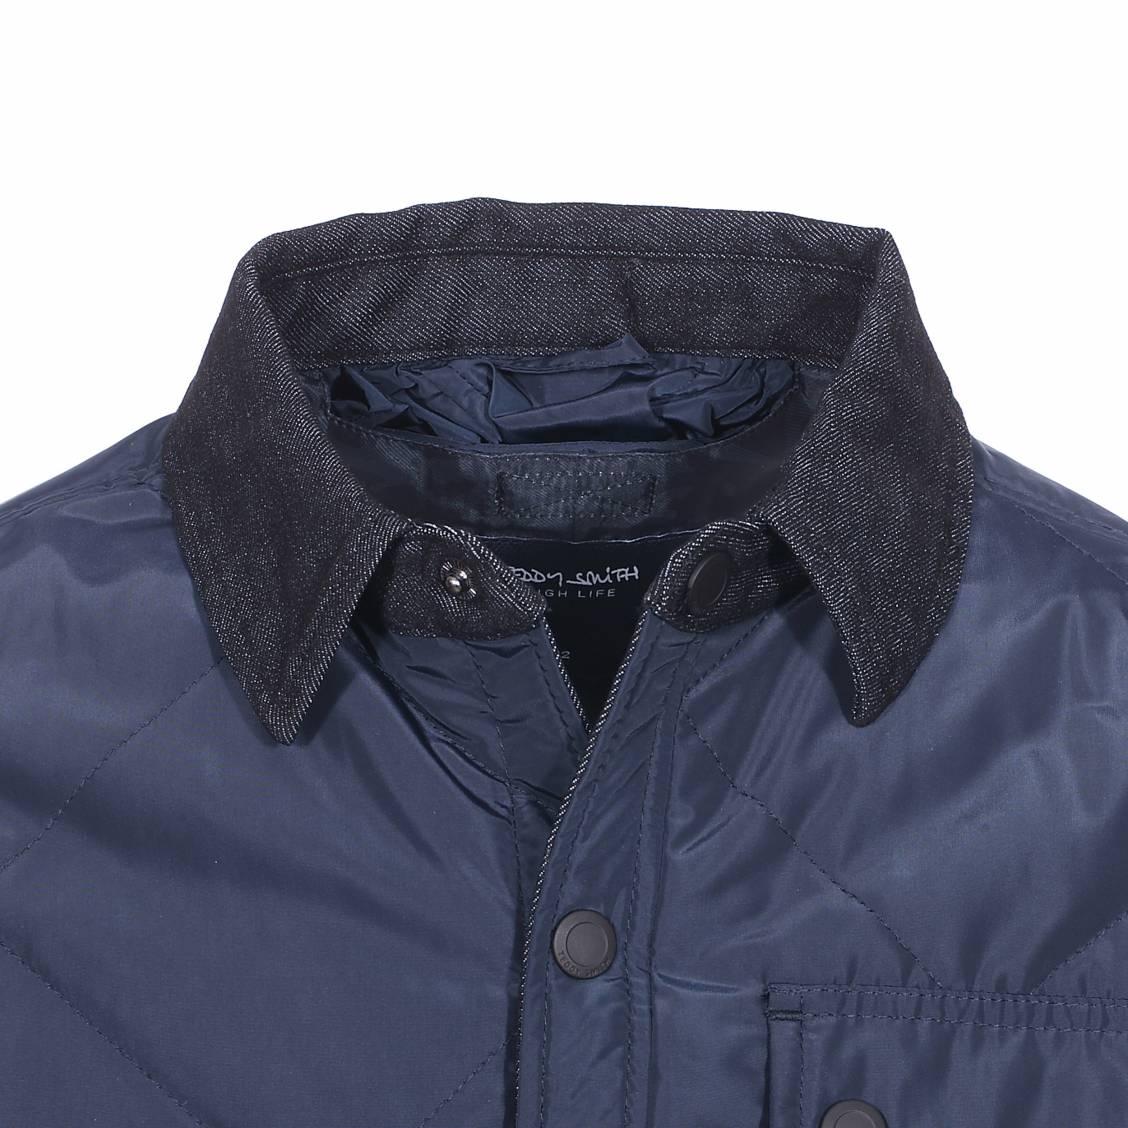 06ee4194422 73212-teddy-smith-junior-e18-blouson-bosco-62005673d-303u-us-navy-veste-boutonnee-teddy-smith-junior-bosco-bleu-marine-2 1128x1128.jpg